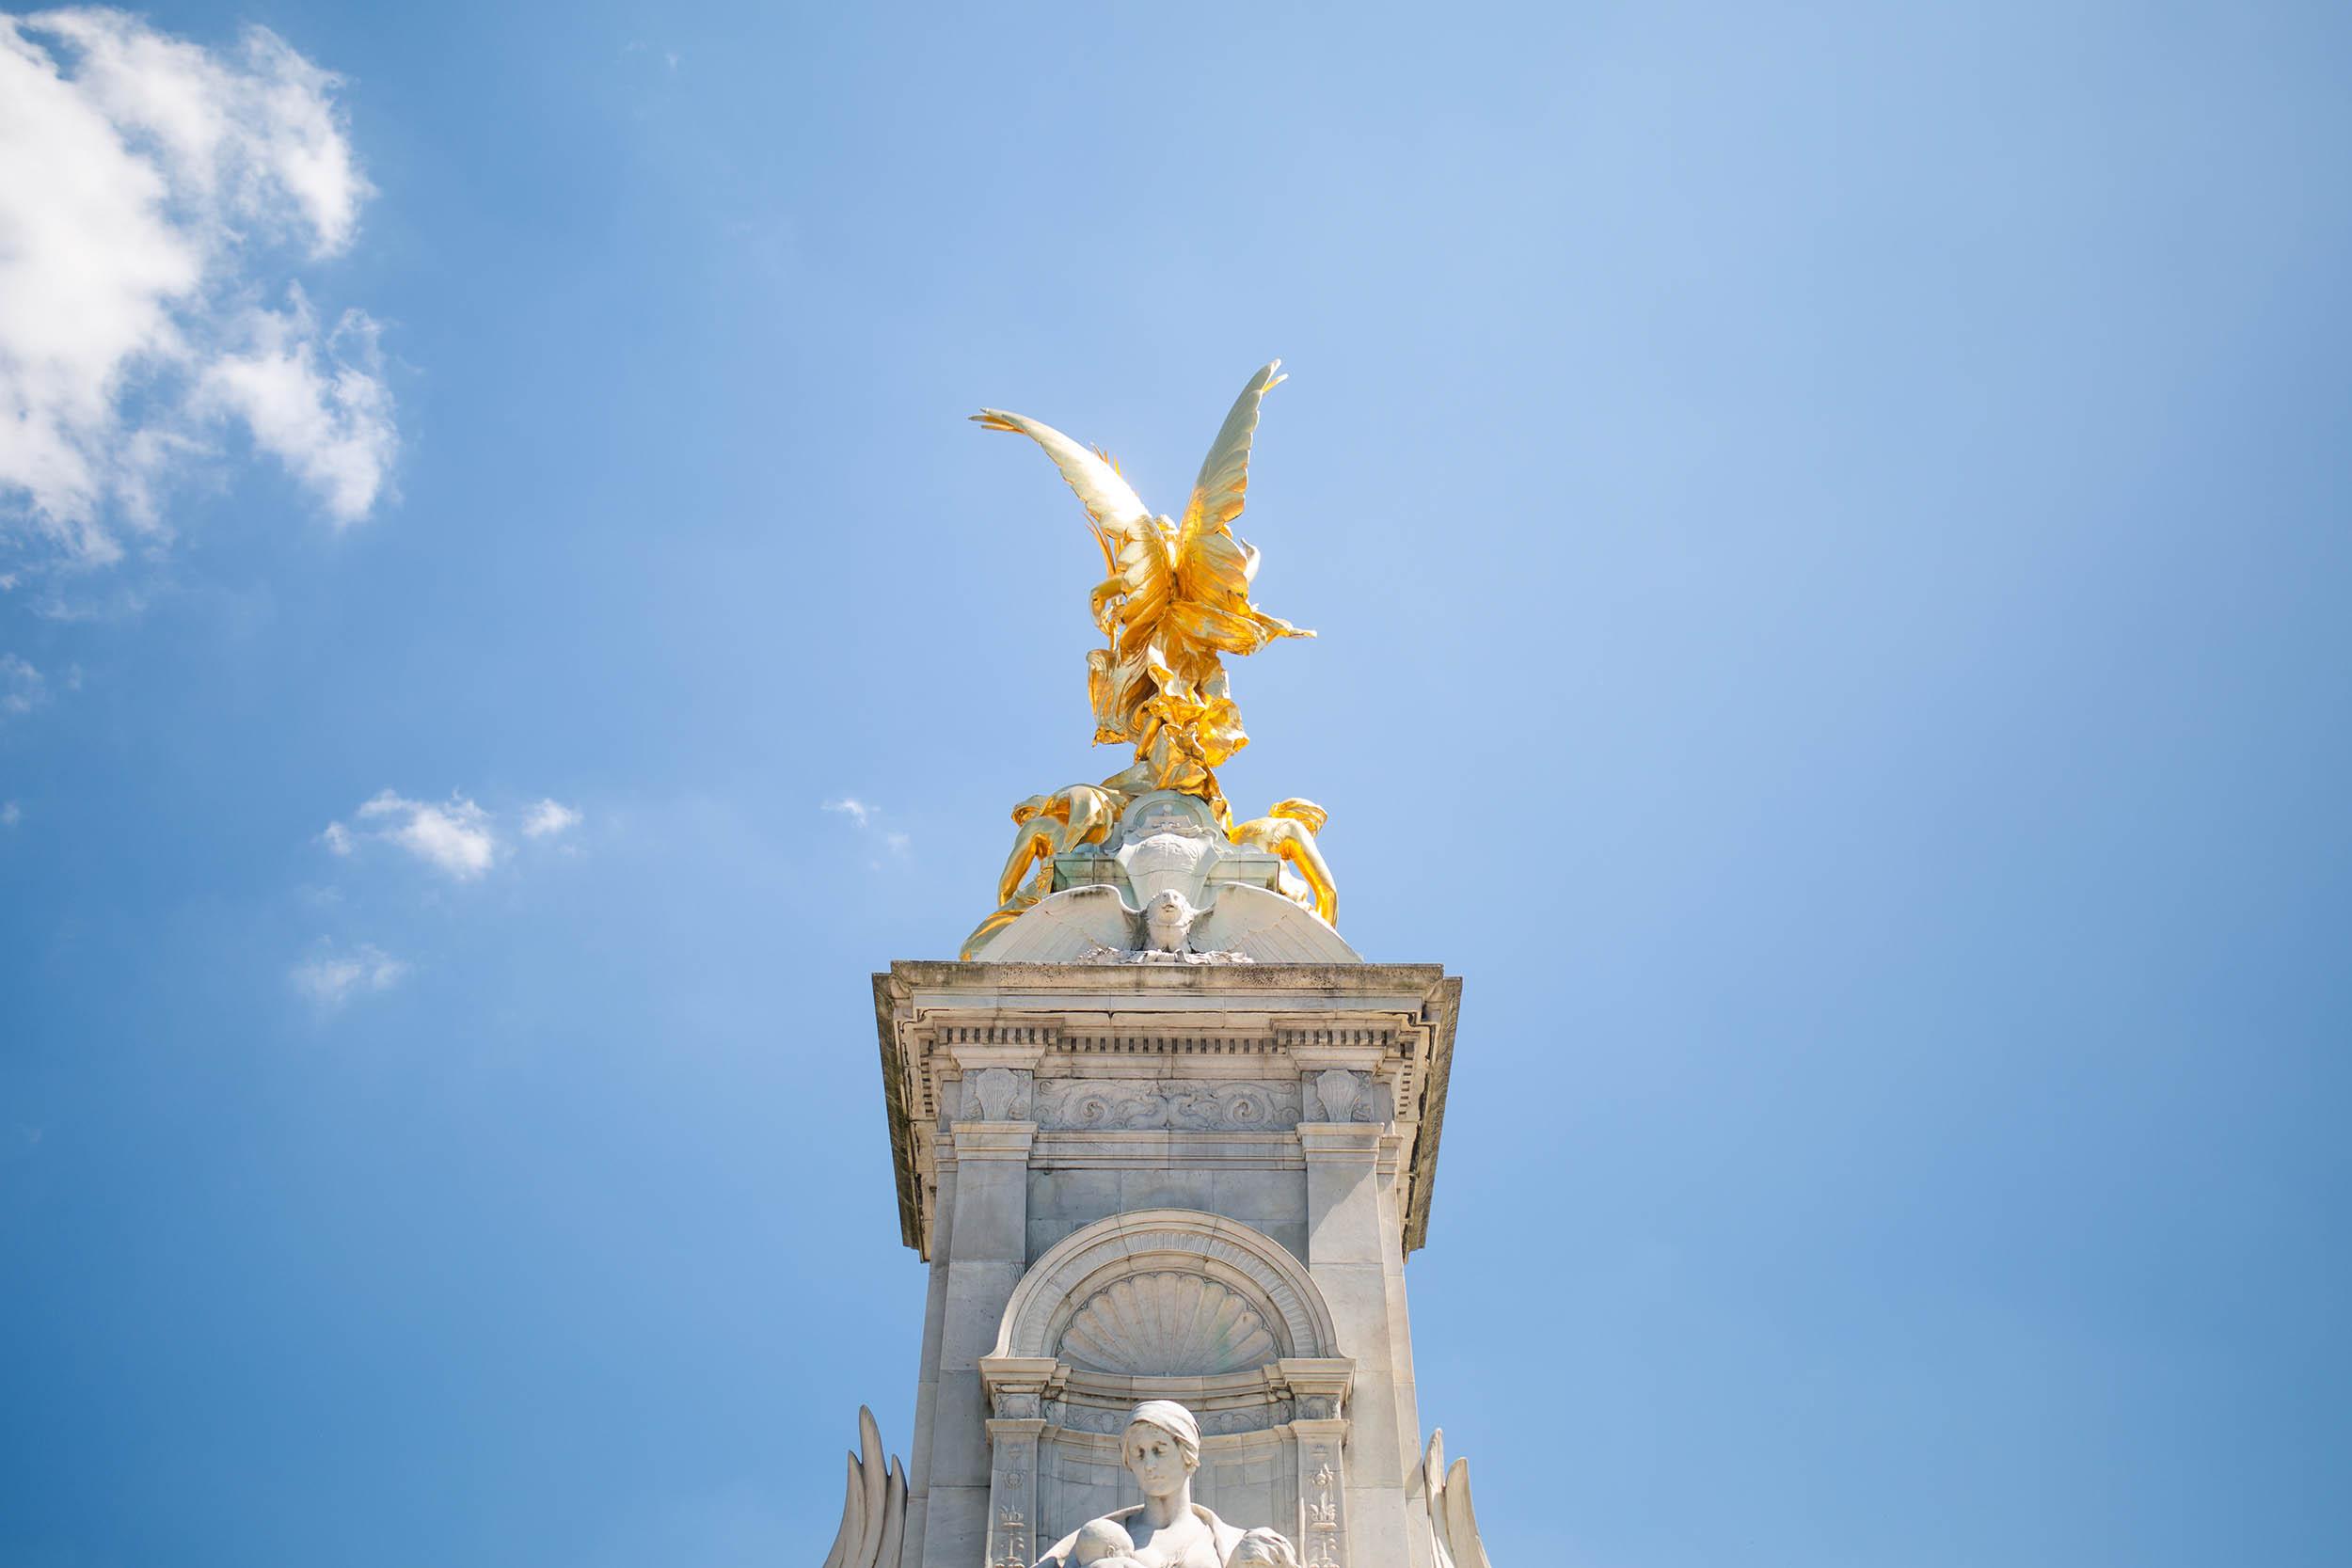 ENGLAND_LONDON_BUCKINGHAMPALACE_0004